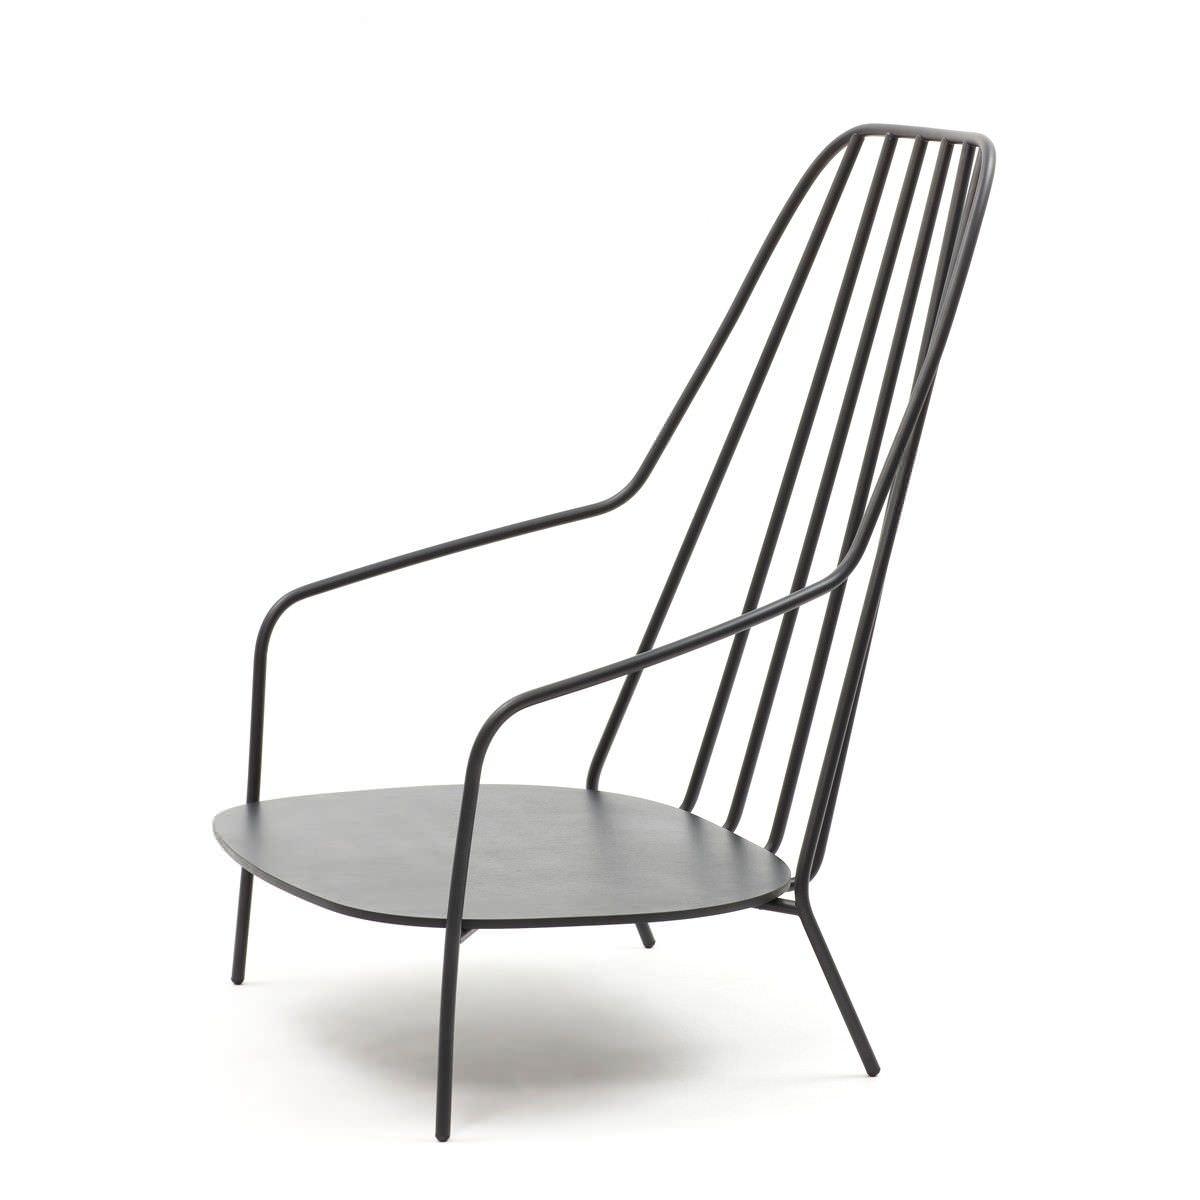 metal armchair children s beach chair with umbrella shoulder straps contemporary paffuta by luca nichetto discipline